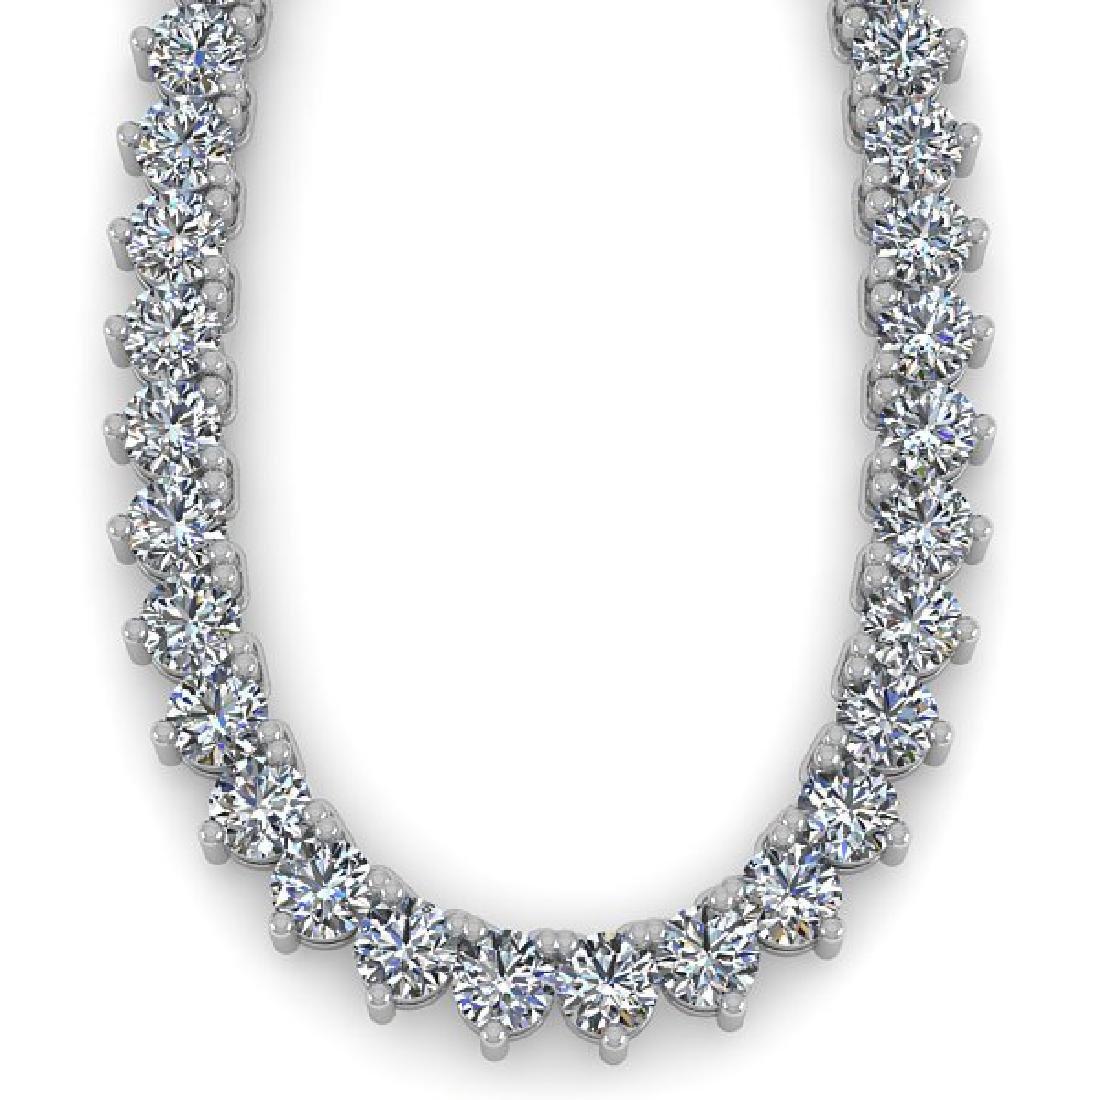 33 CTW Solitaire SI Diamond Necklace 14K White Gold - 2